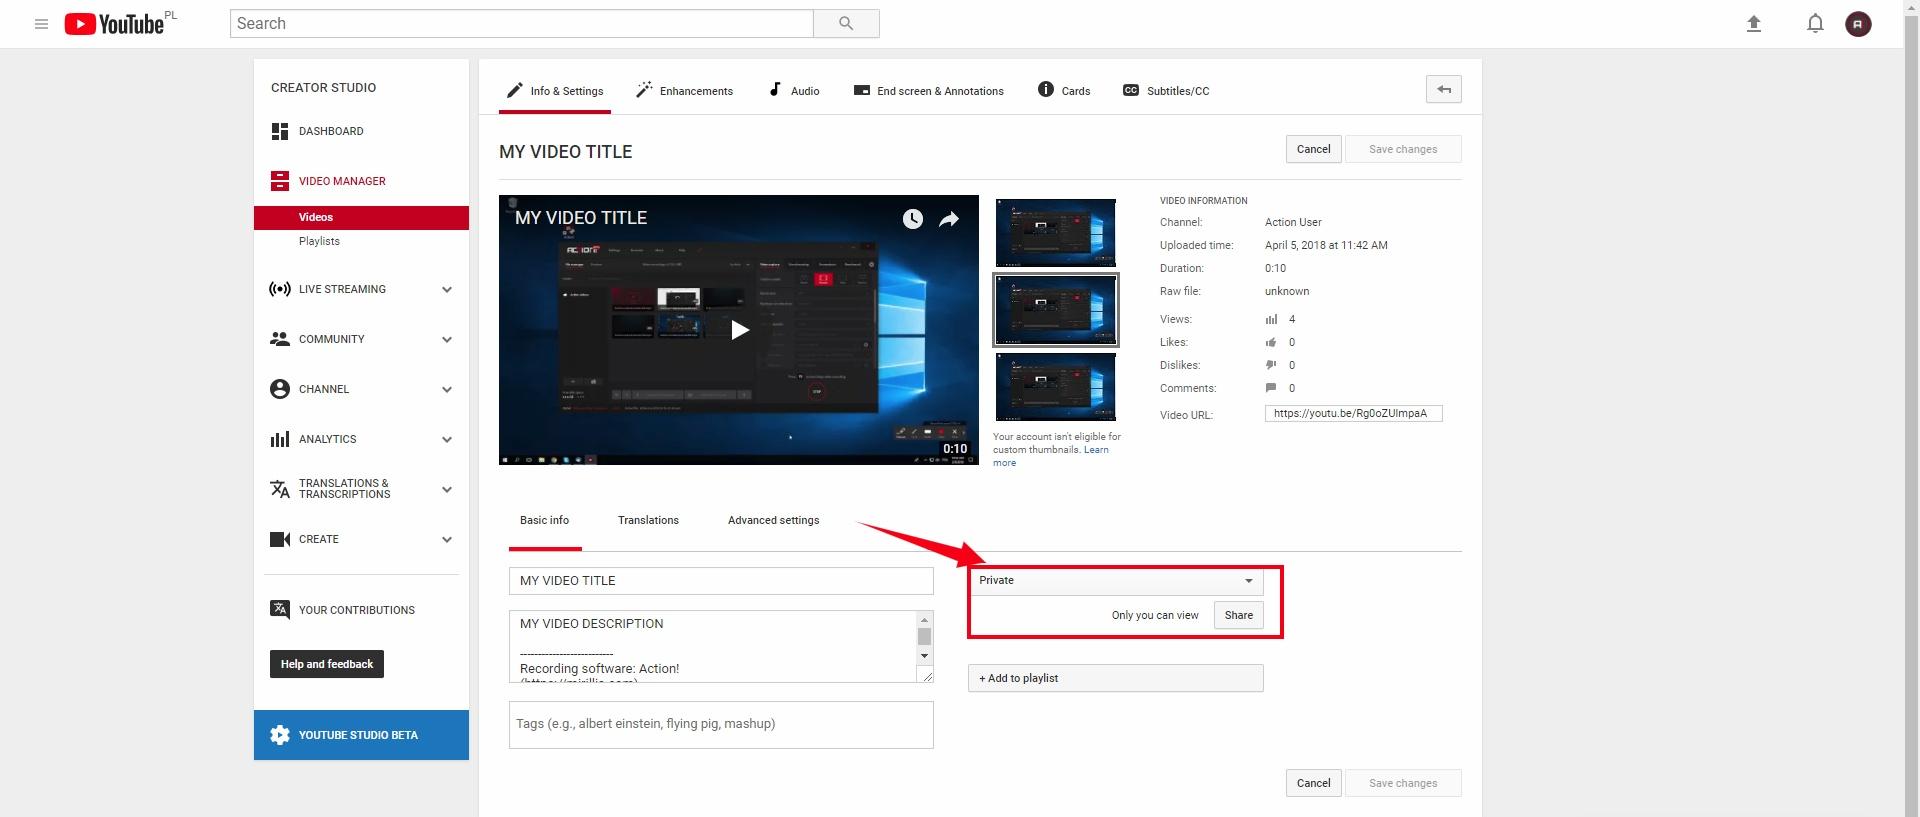 YouTube's user panel